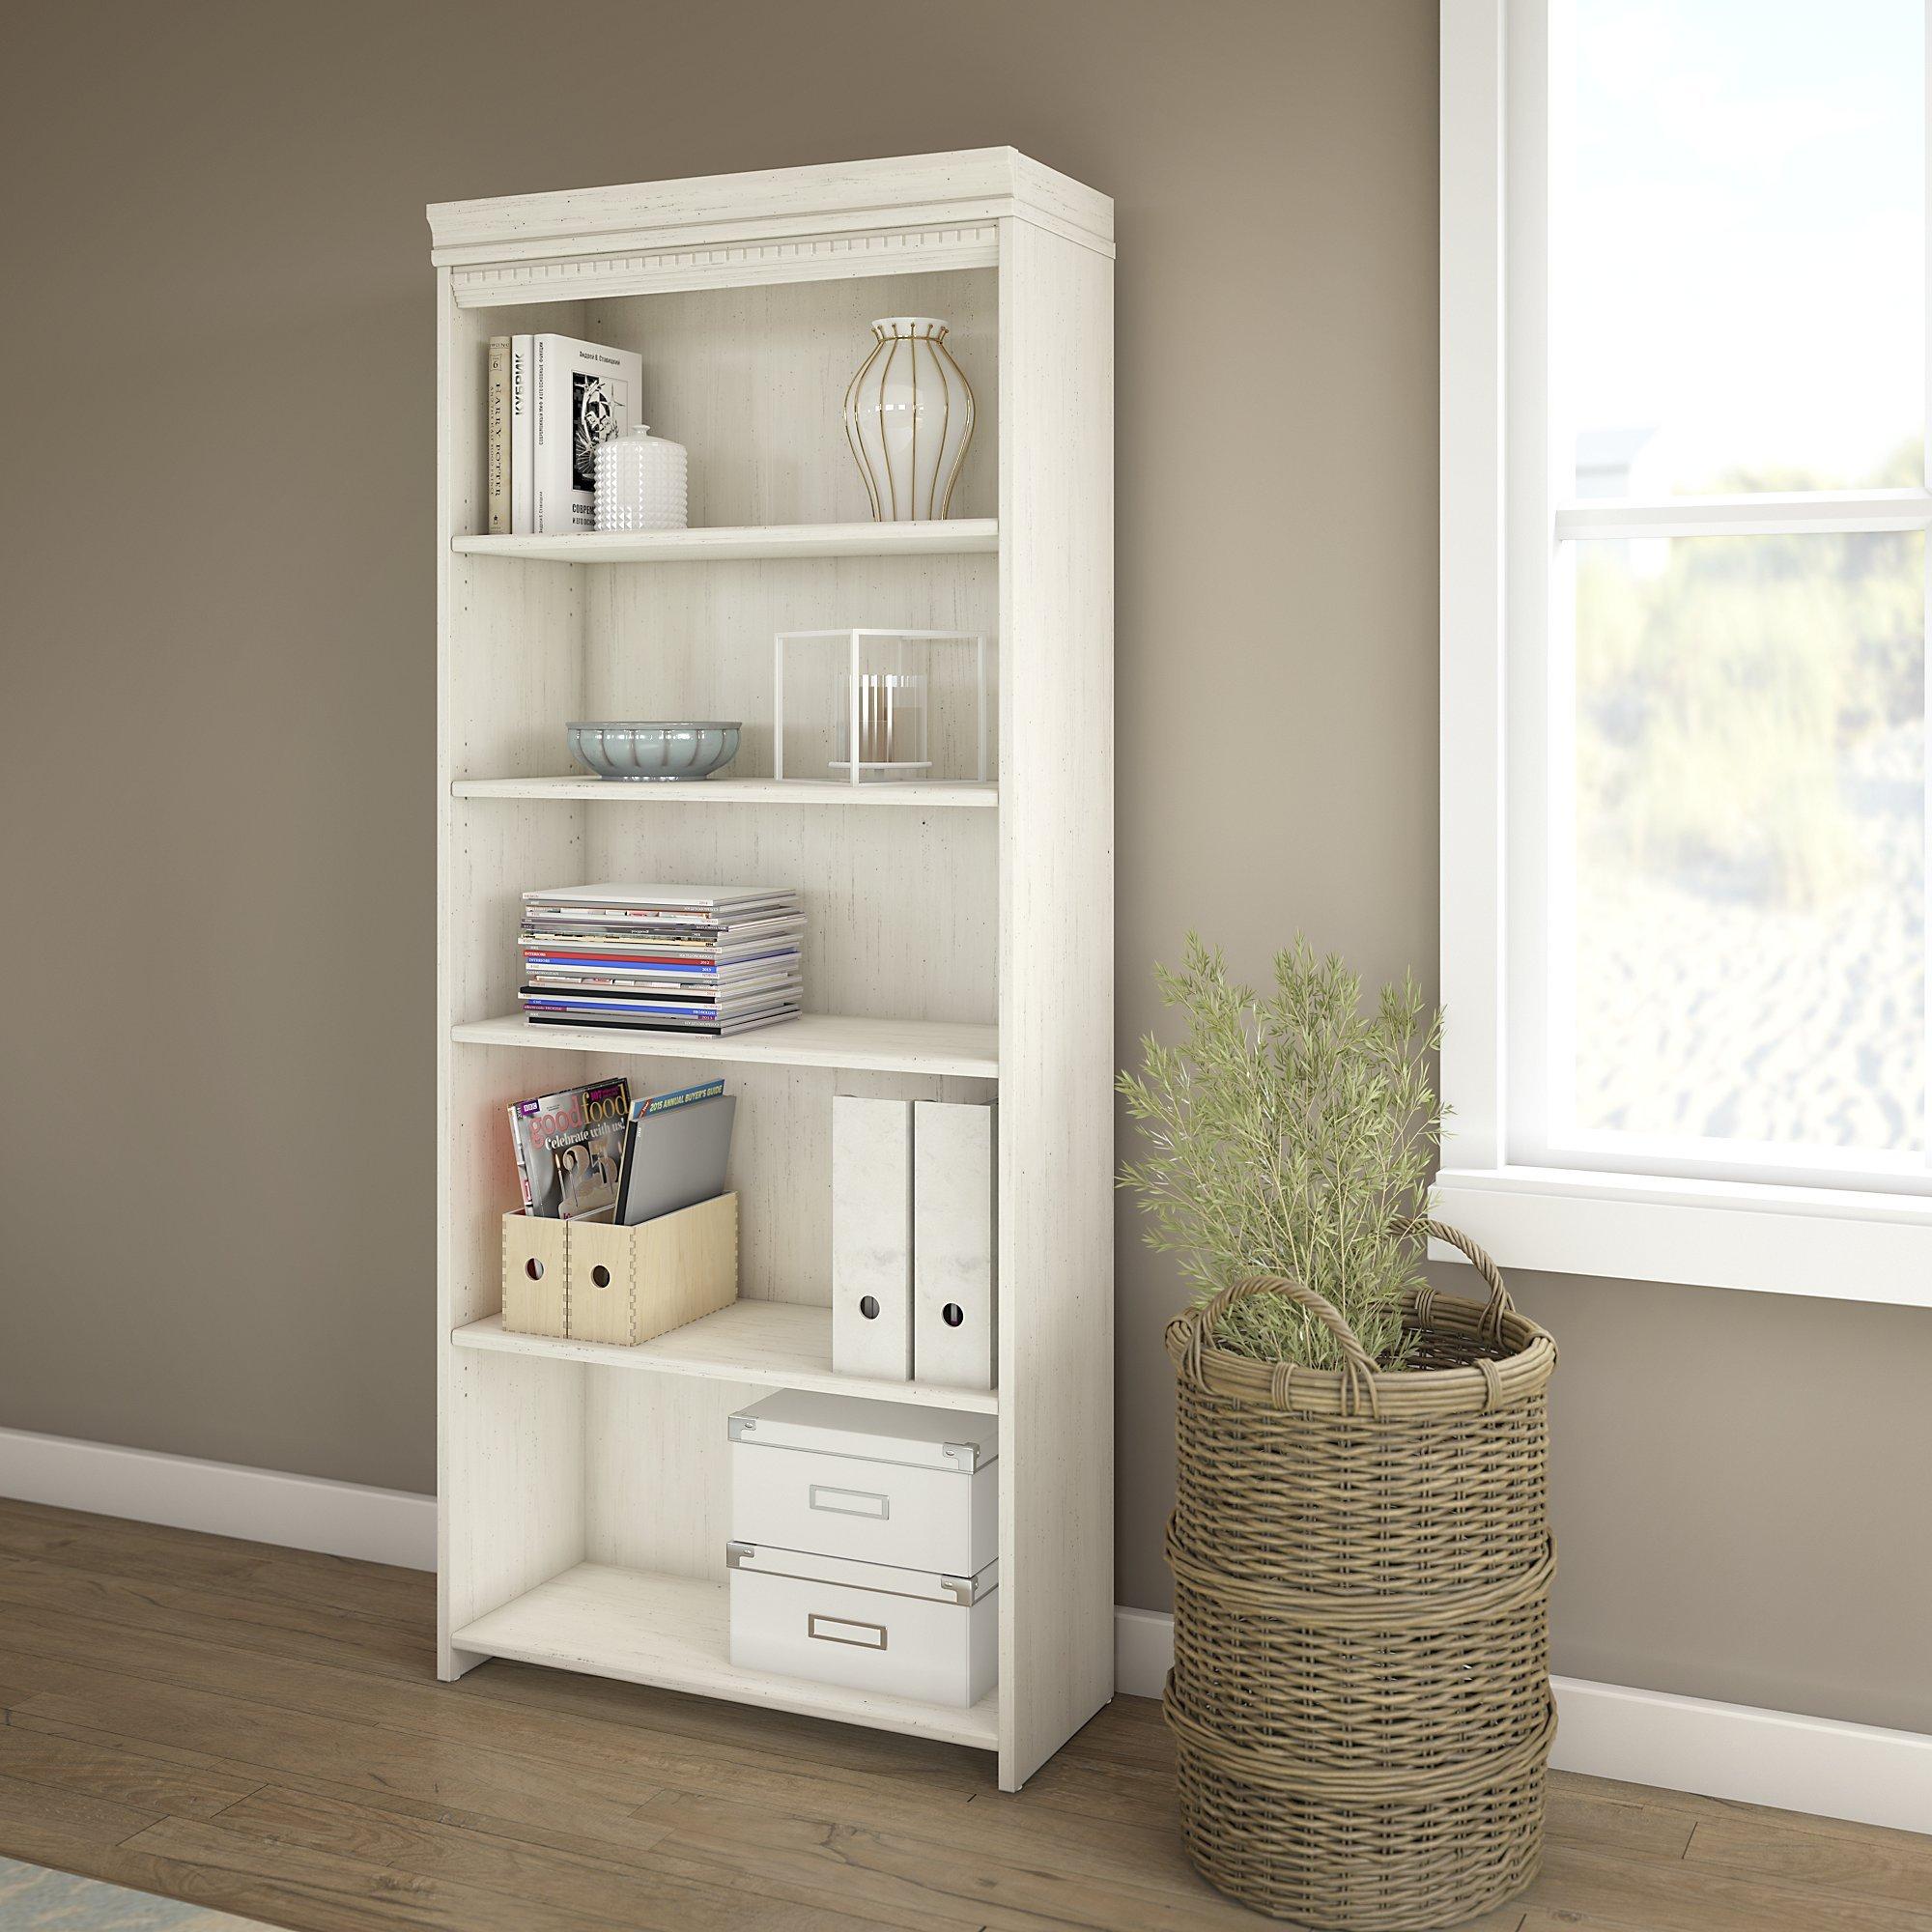 Bush Furniture Fairview 5 Shelf Bookcase in Antique White by Bush Furniture (Image #2)